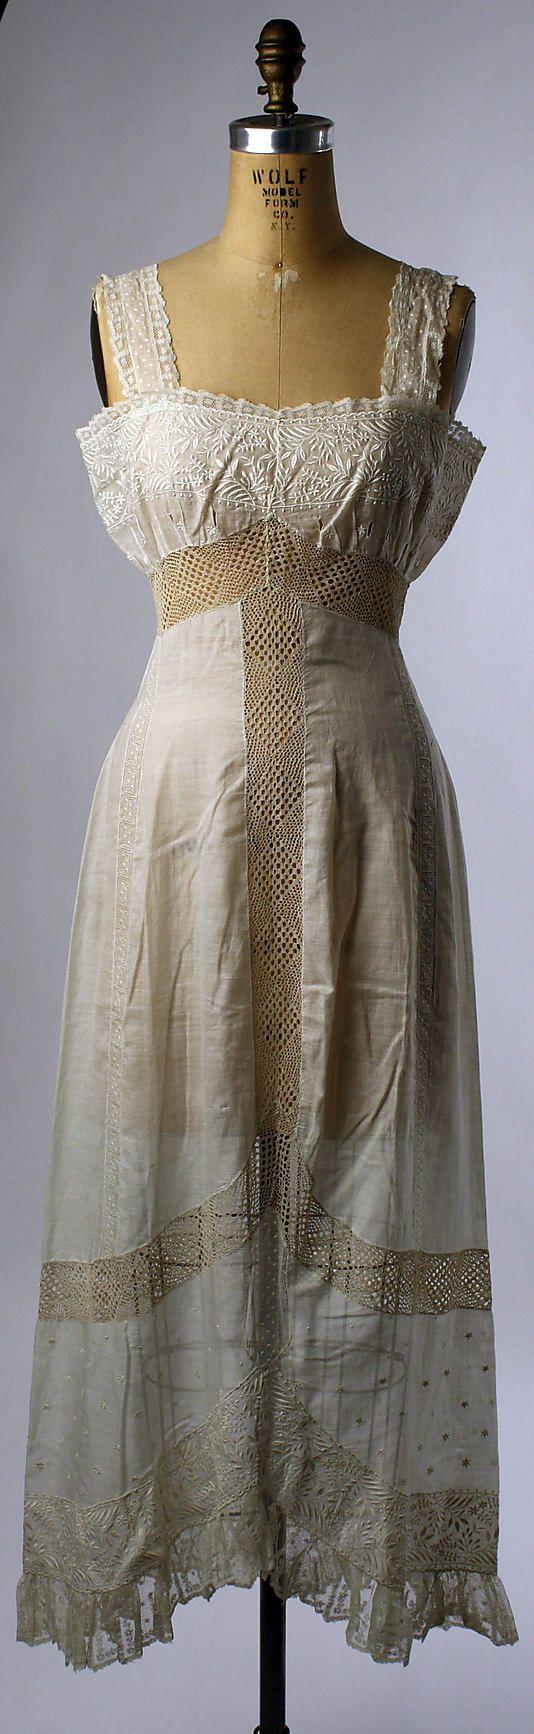 1909-11 French Petticoat